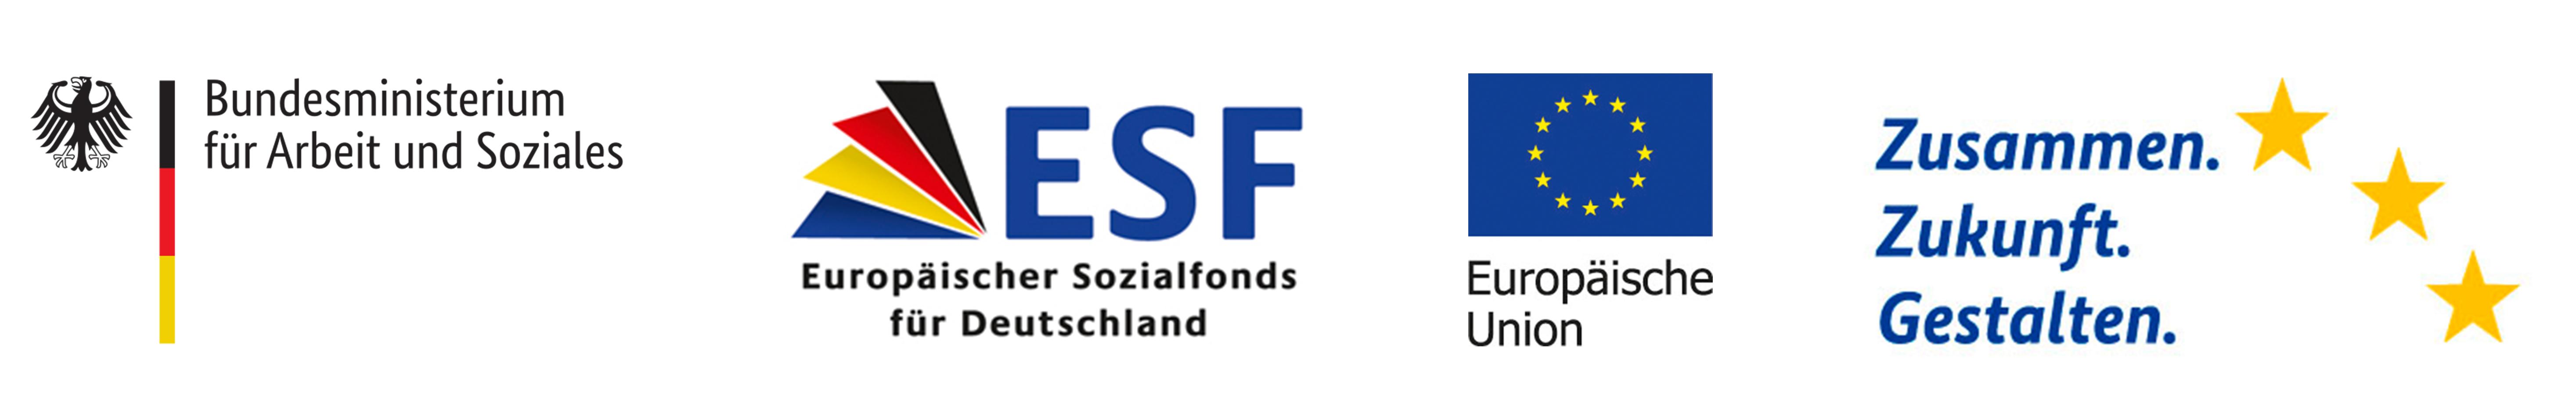 Logoleiste 1